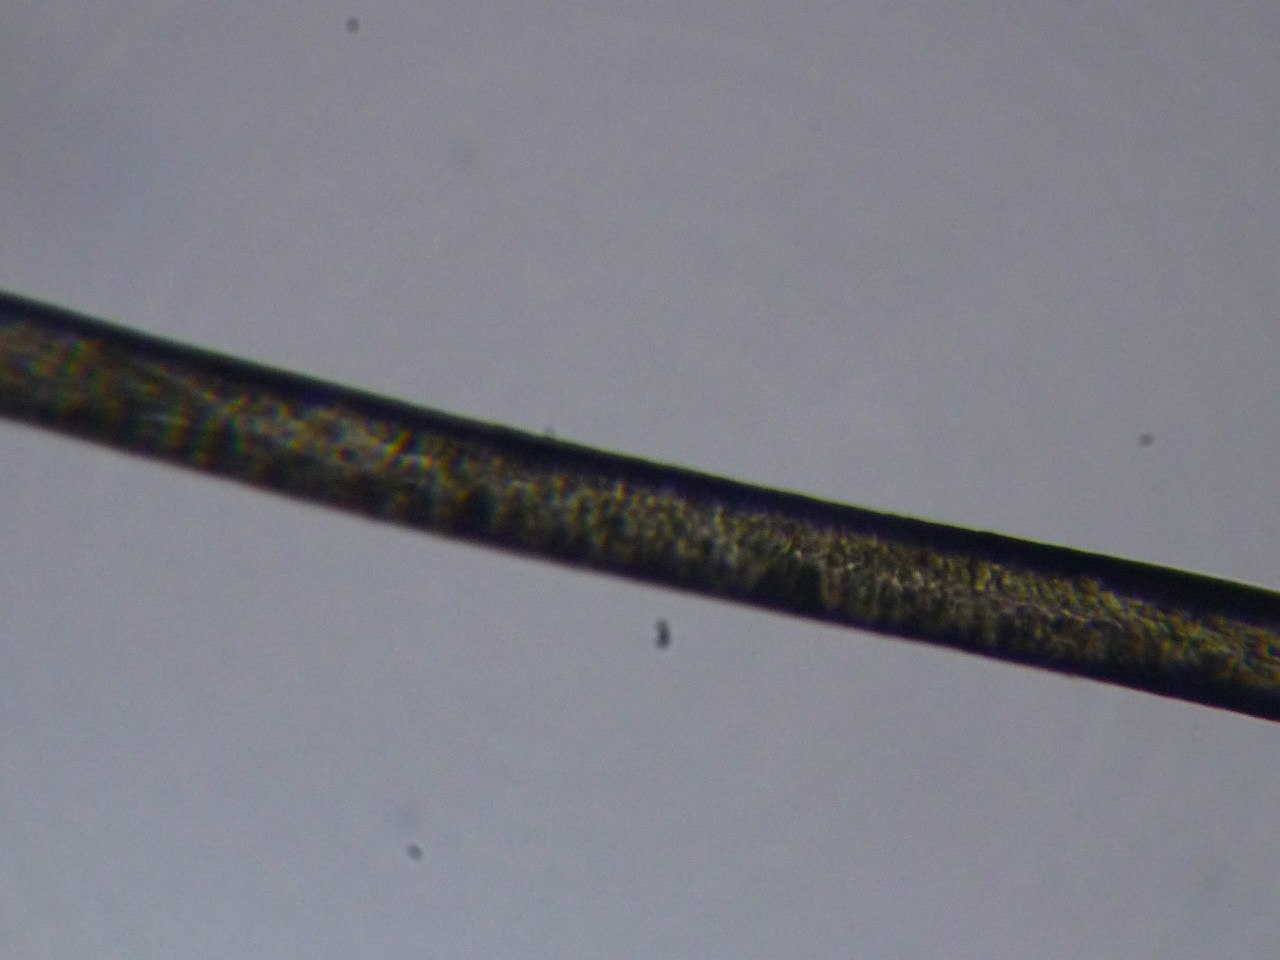 волос через микроскоп